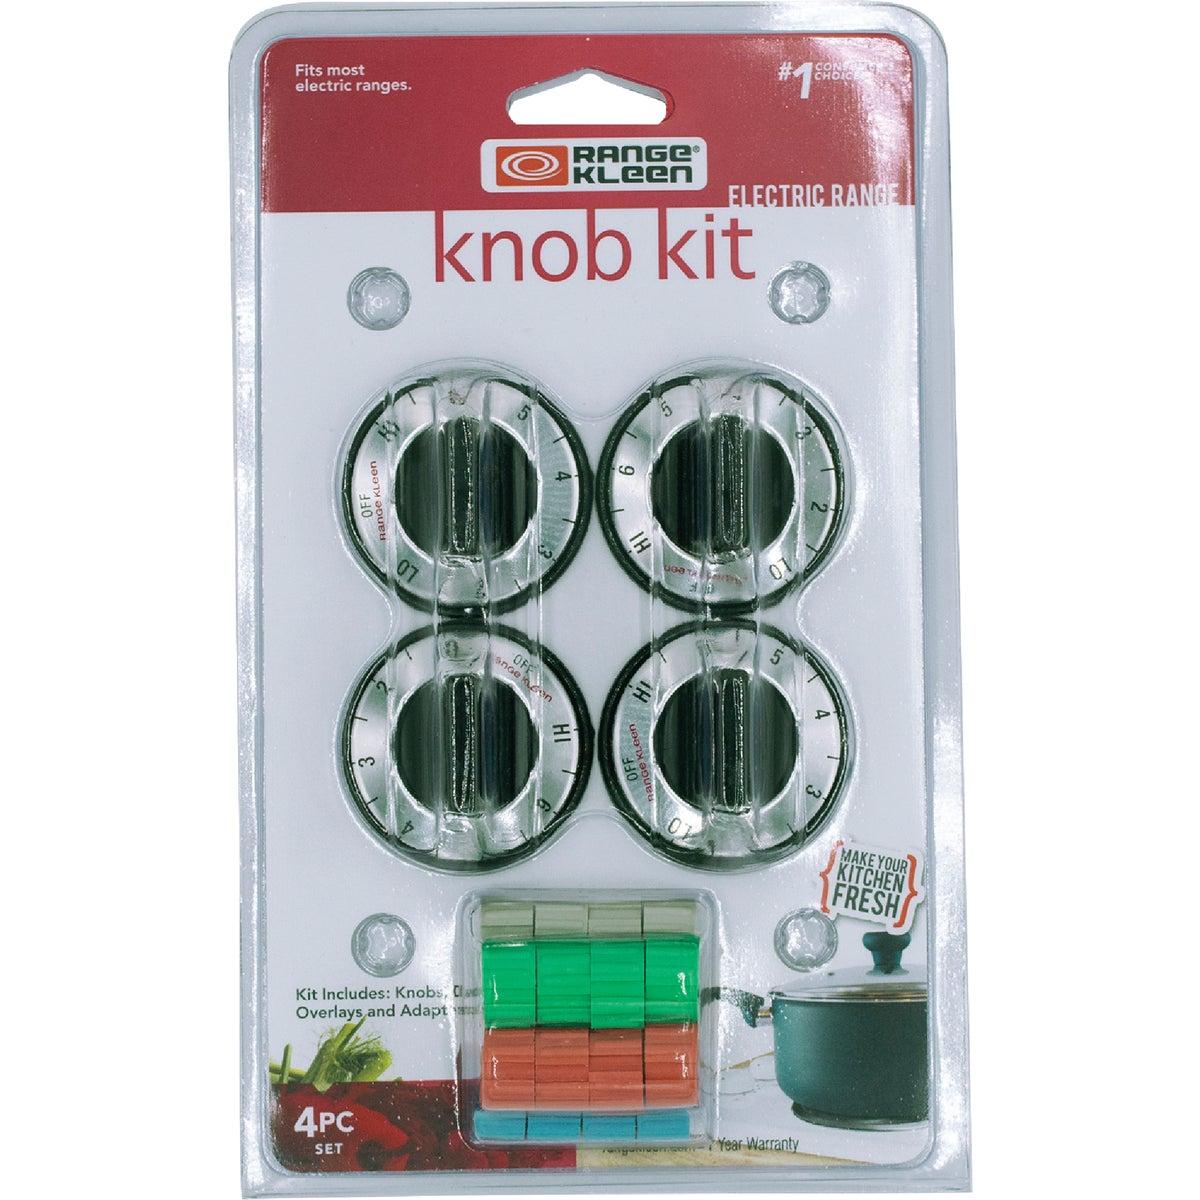 Range Kleen BLACK ELECTRIC KNOB KIT 8114